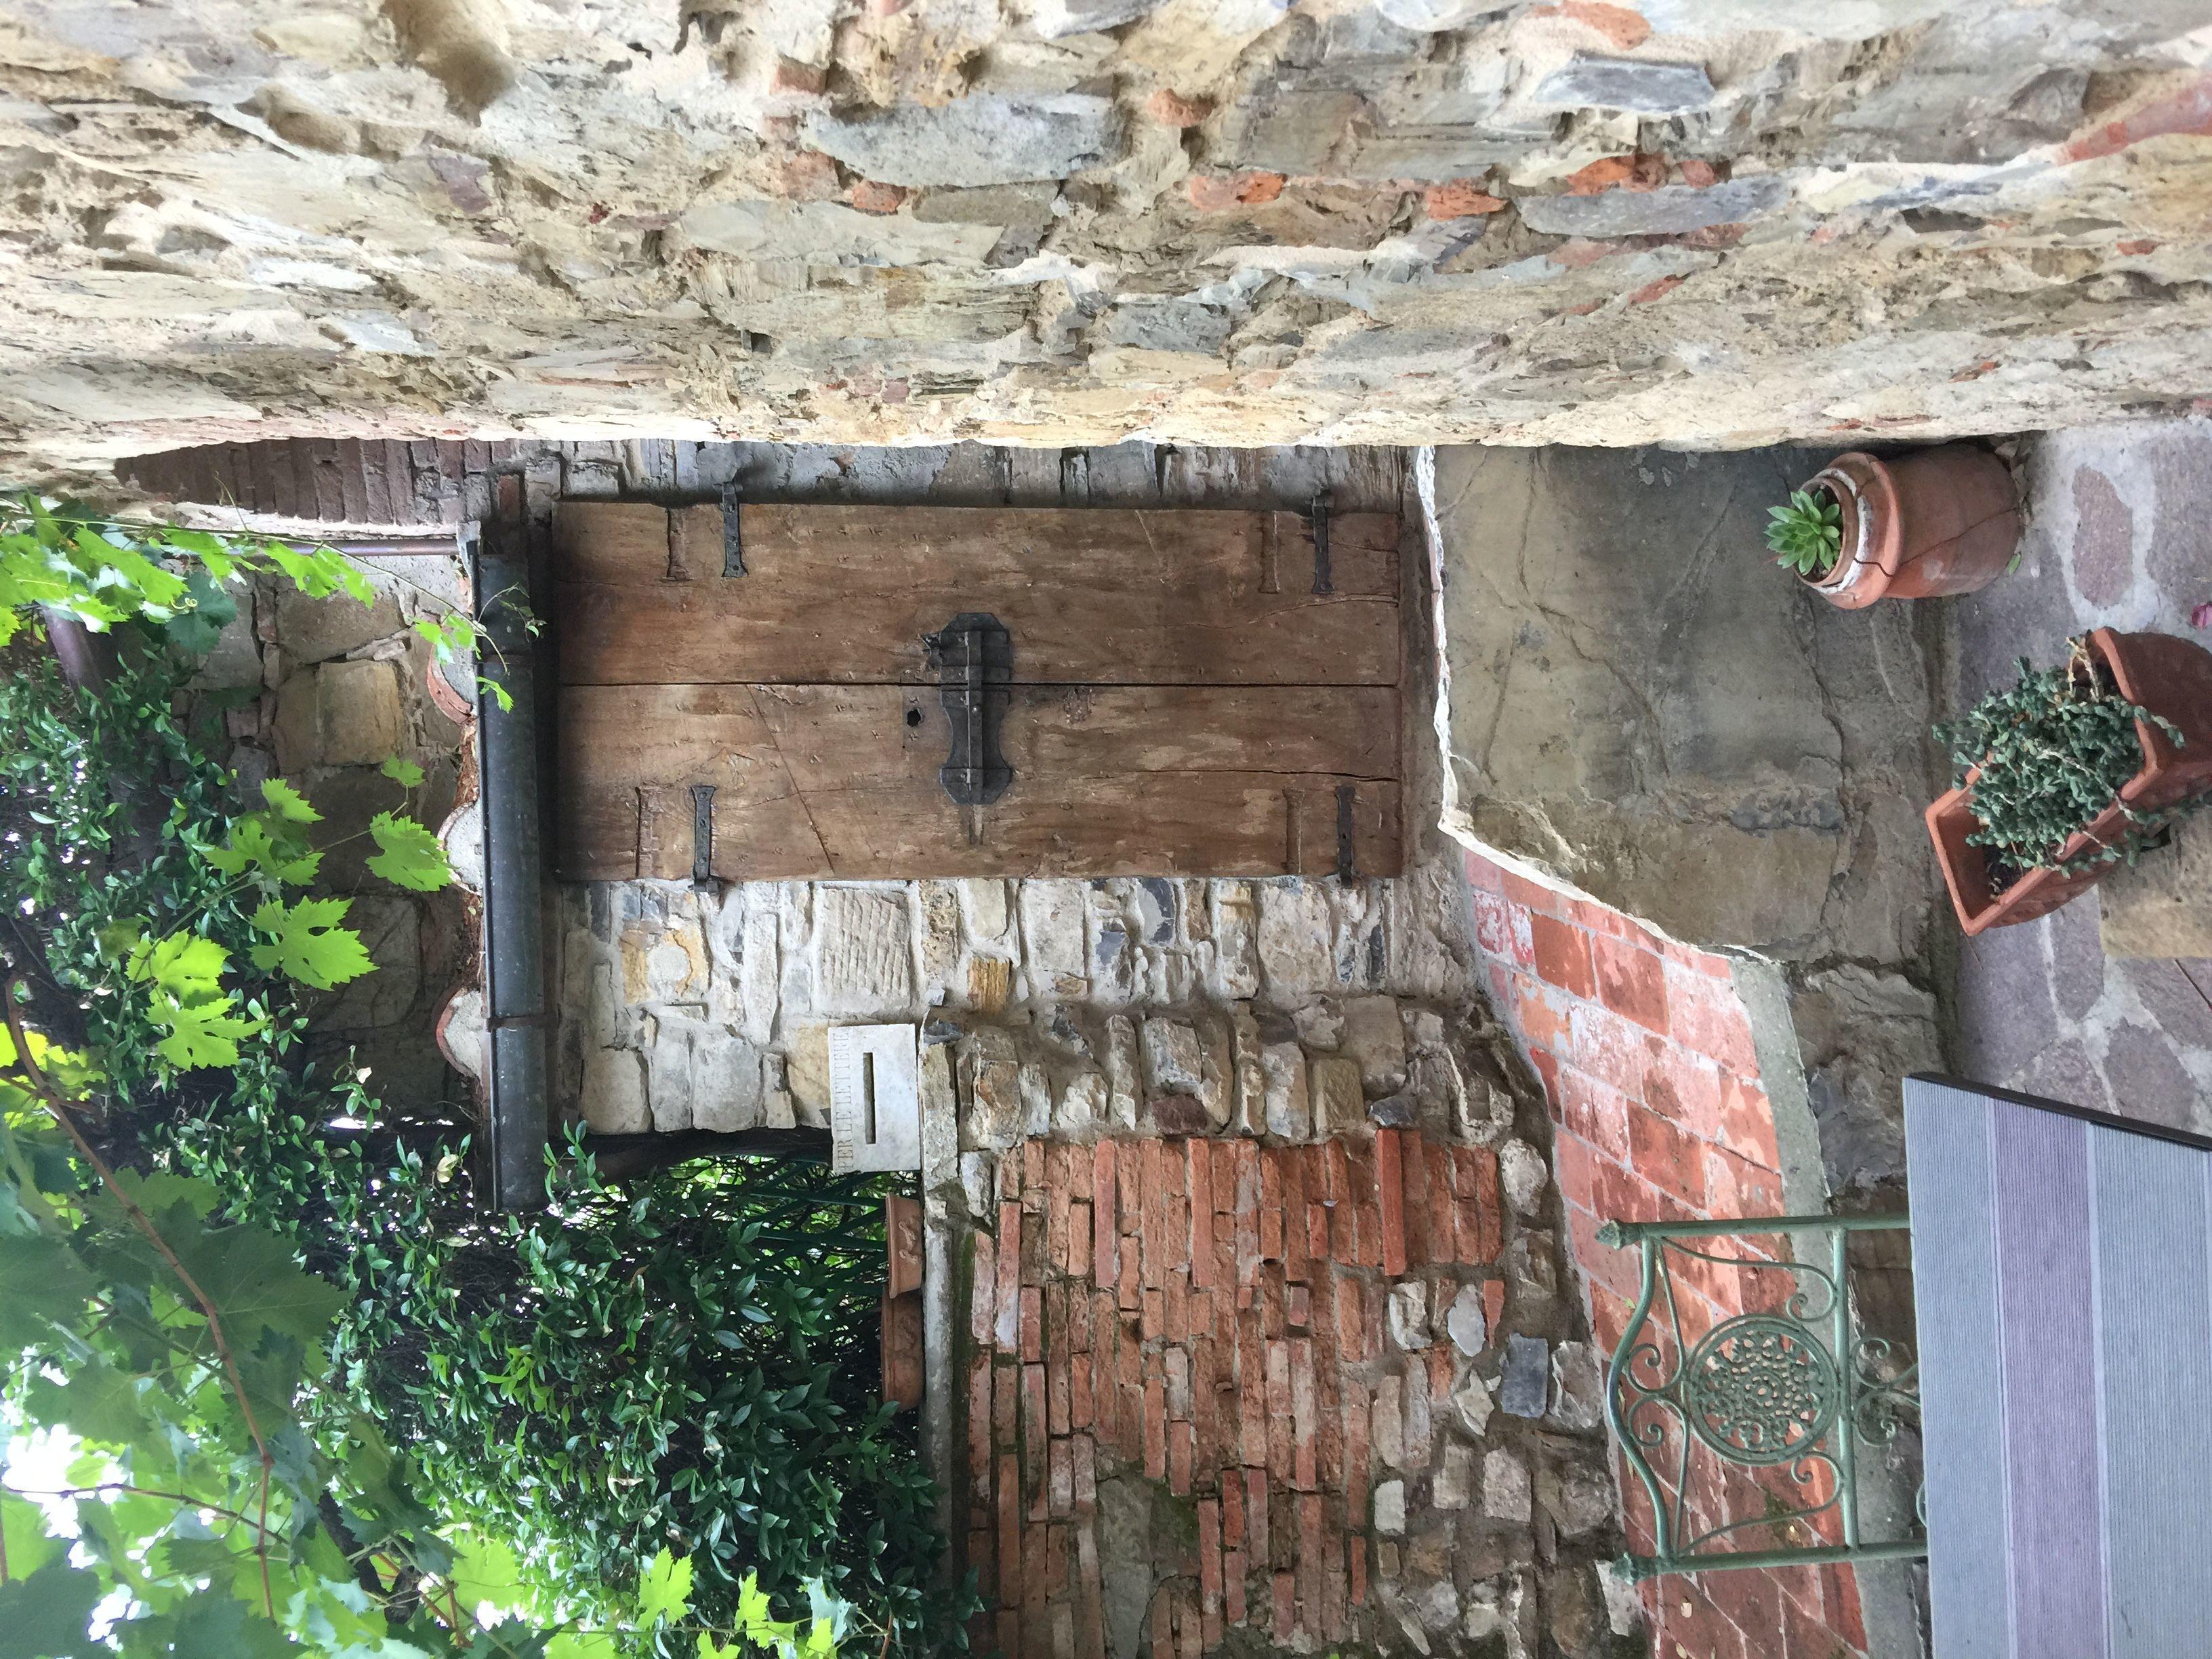 Villa fracassini 6 slaapplaatsen in 3 slaapkamers pergine valdarno toscane itali - Kubieke villa ...